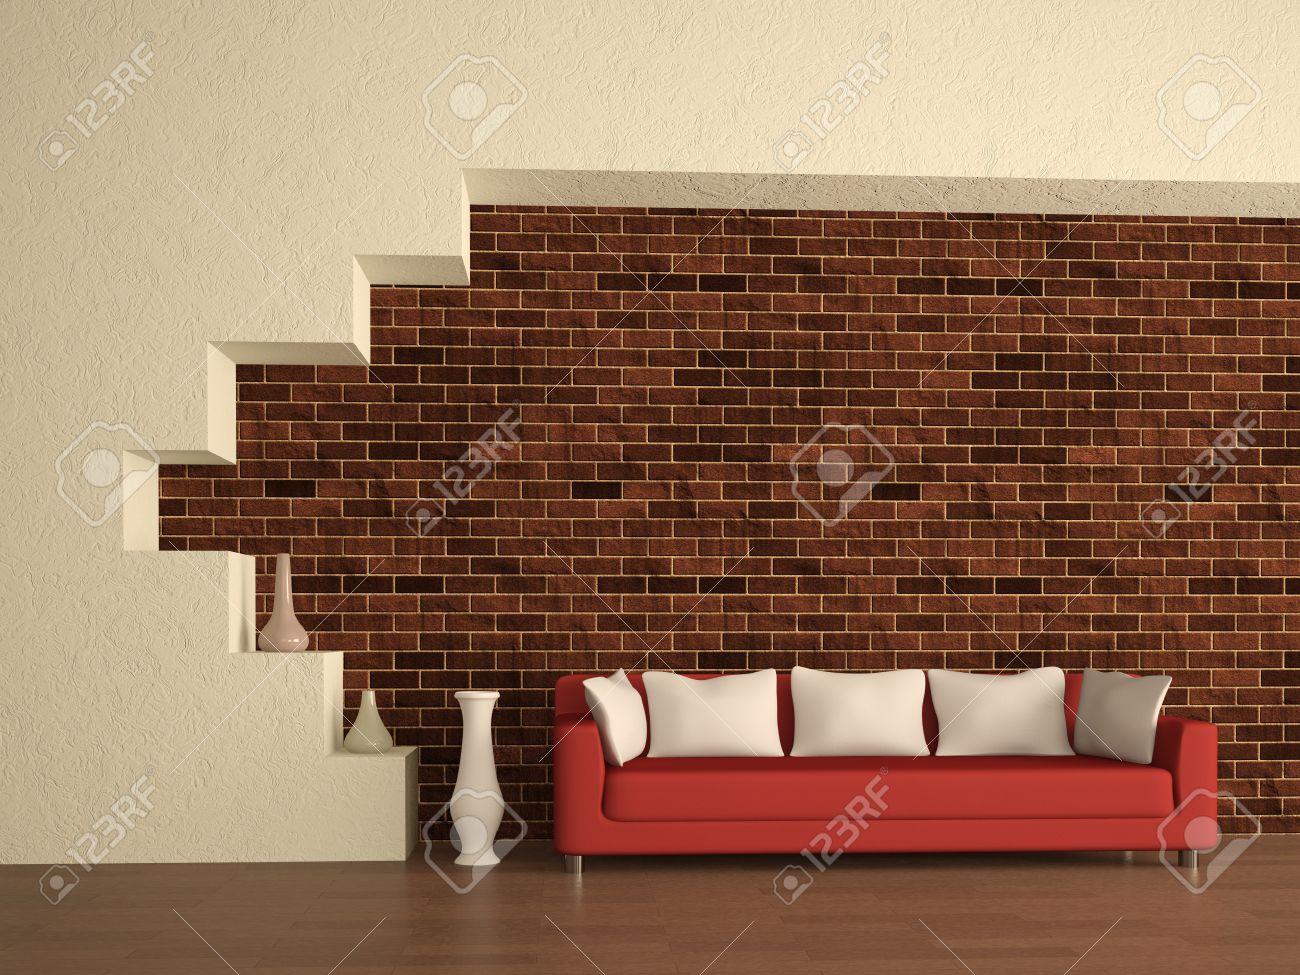 Stock Photo   The Red Sofa Near A Brick Wall